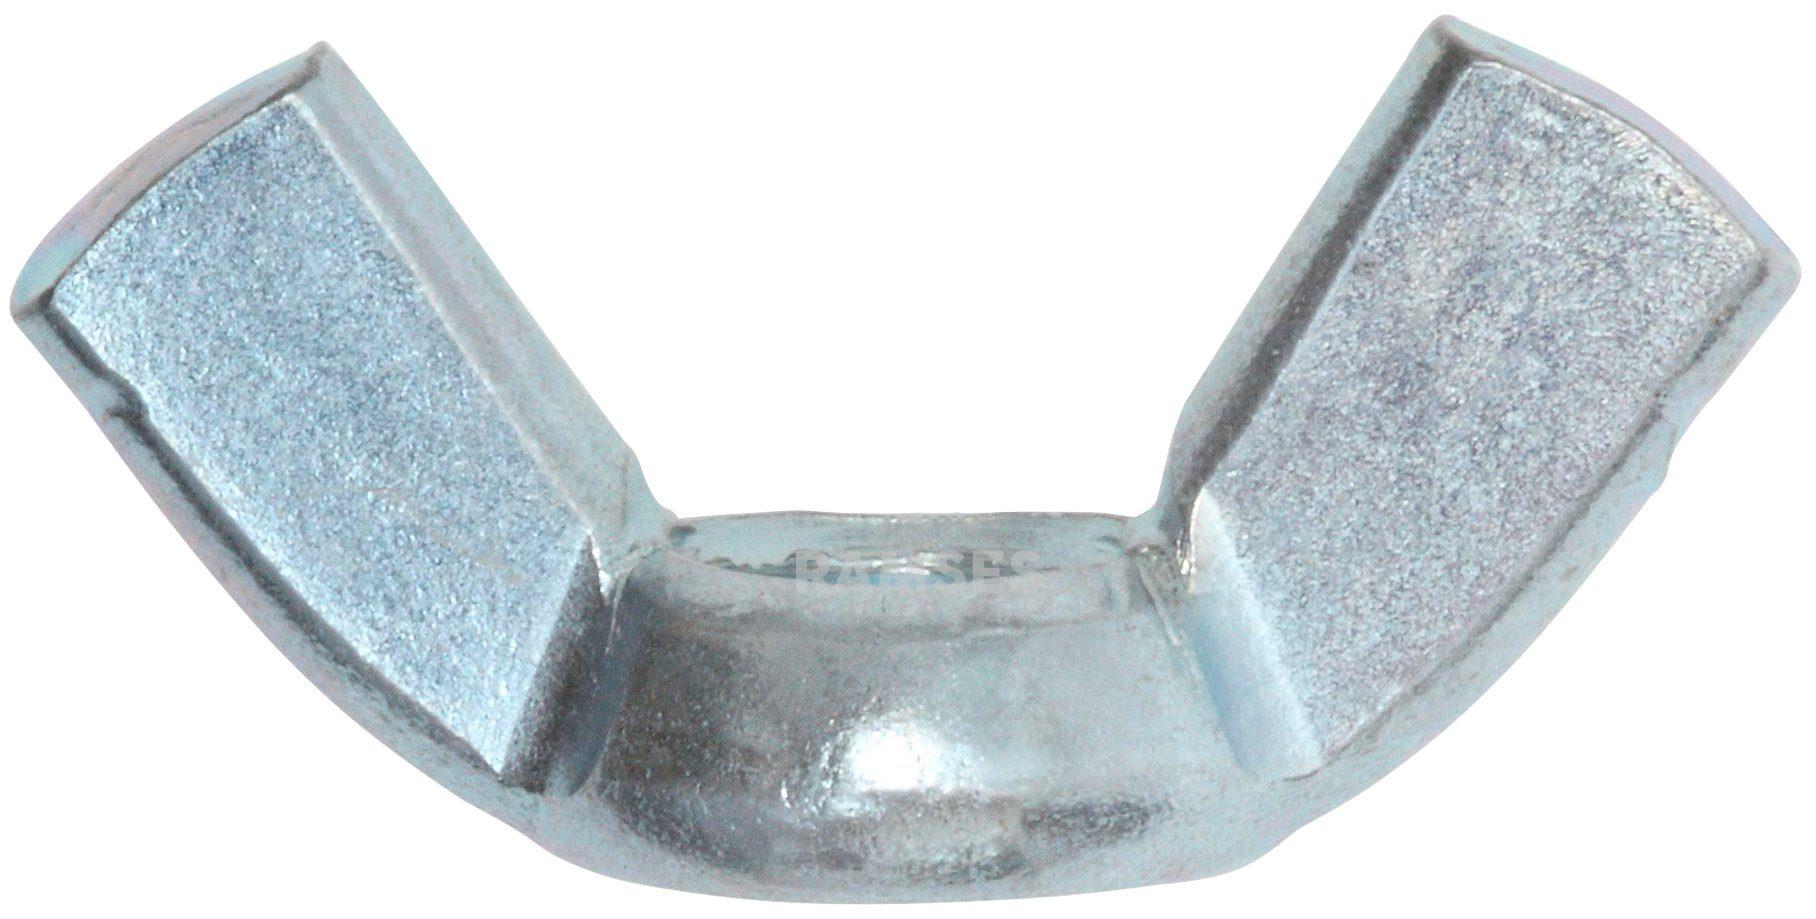 RAMSES Flügelmutter , DIN 315 Amerikanische Form M4, 100 Stück